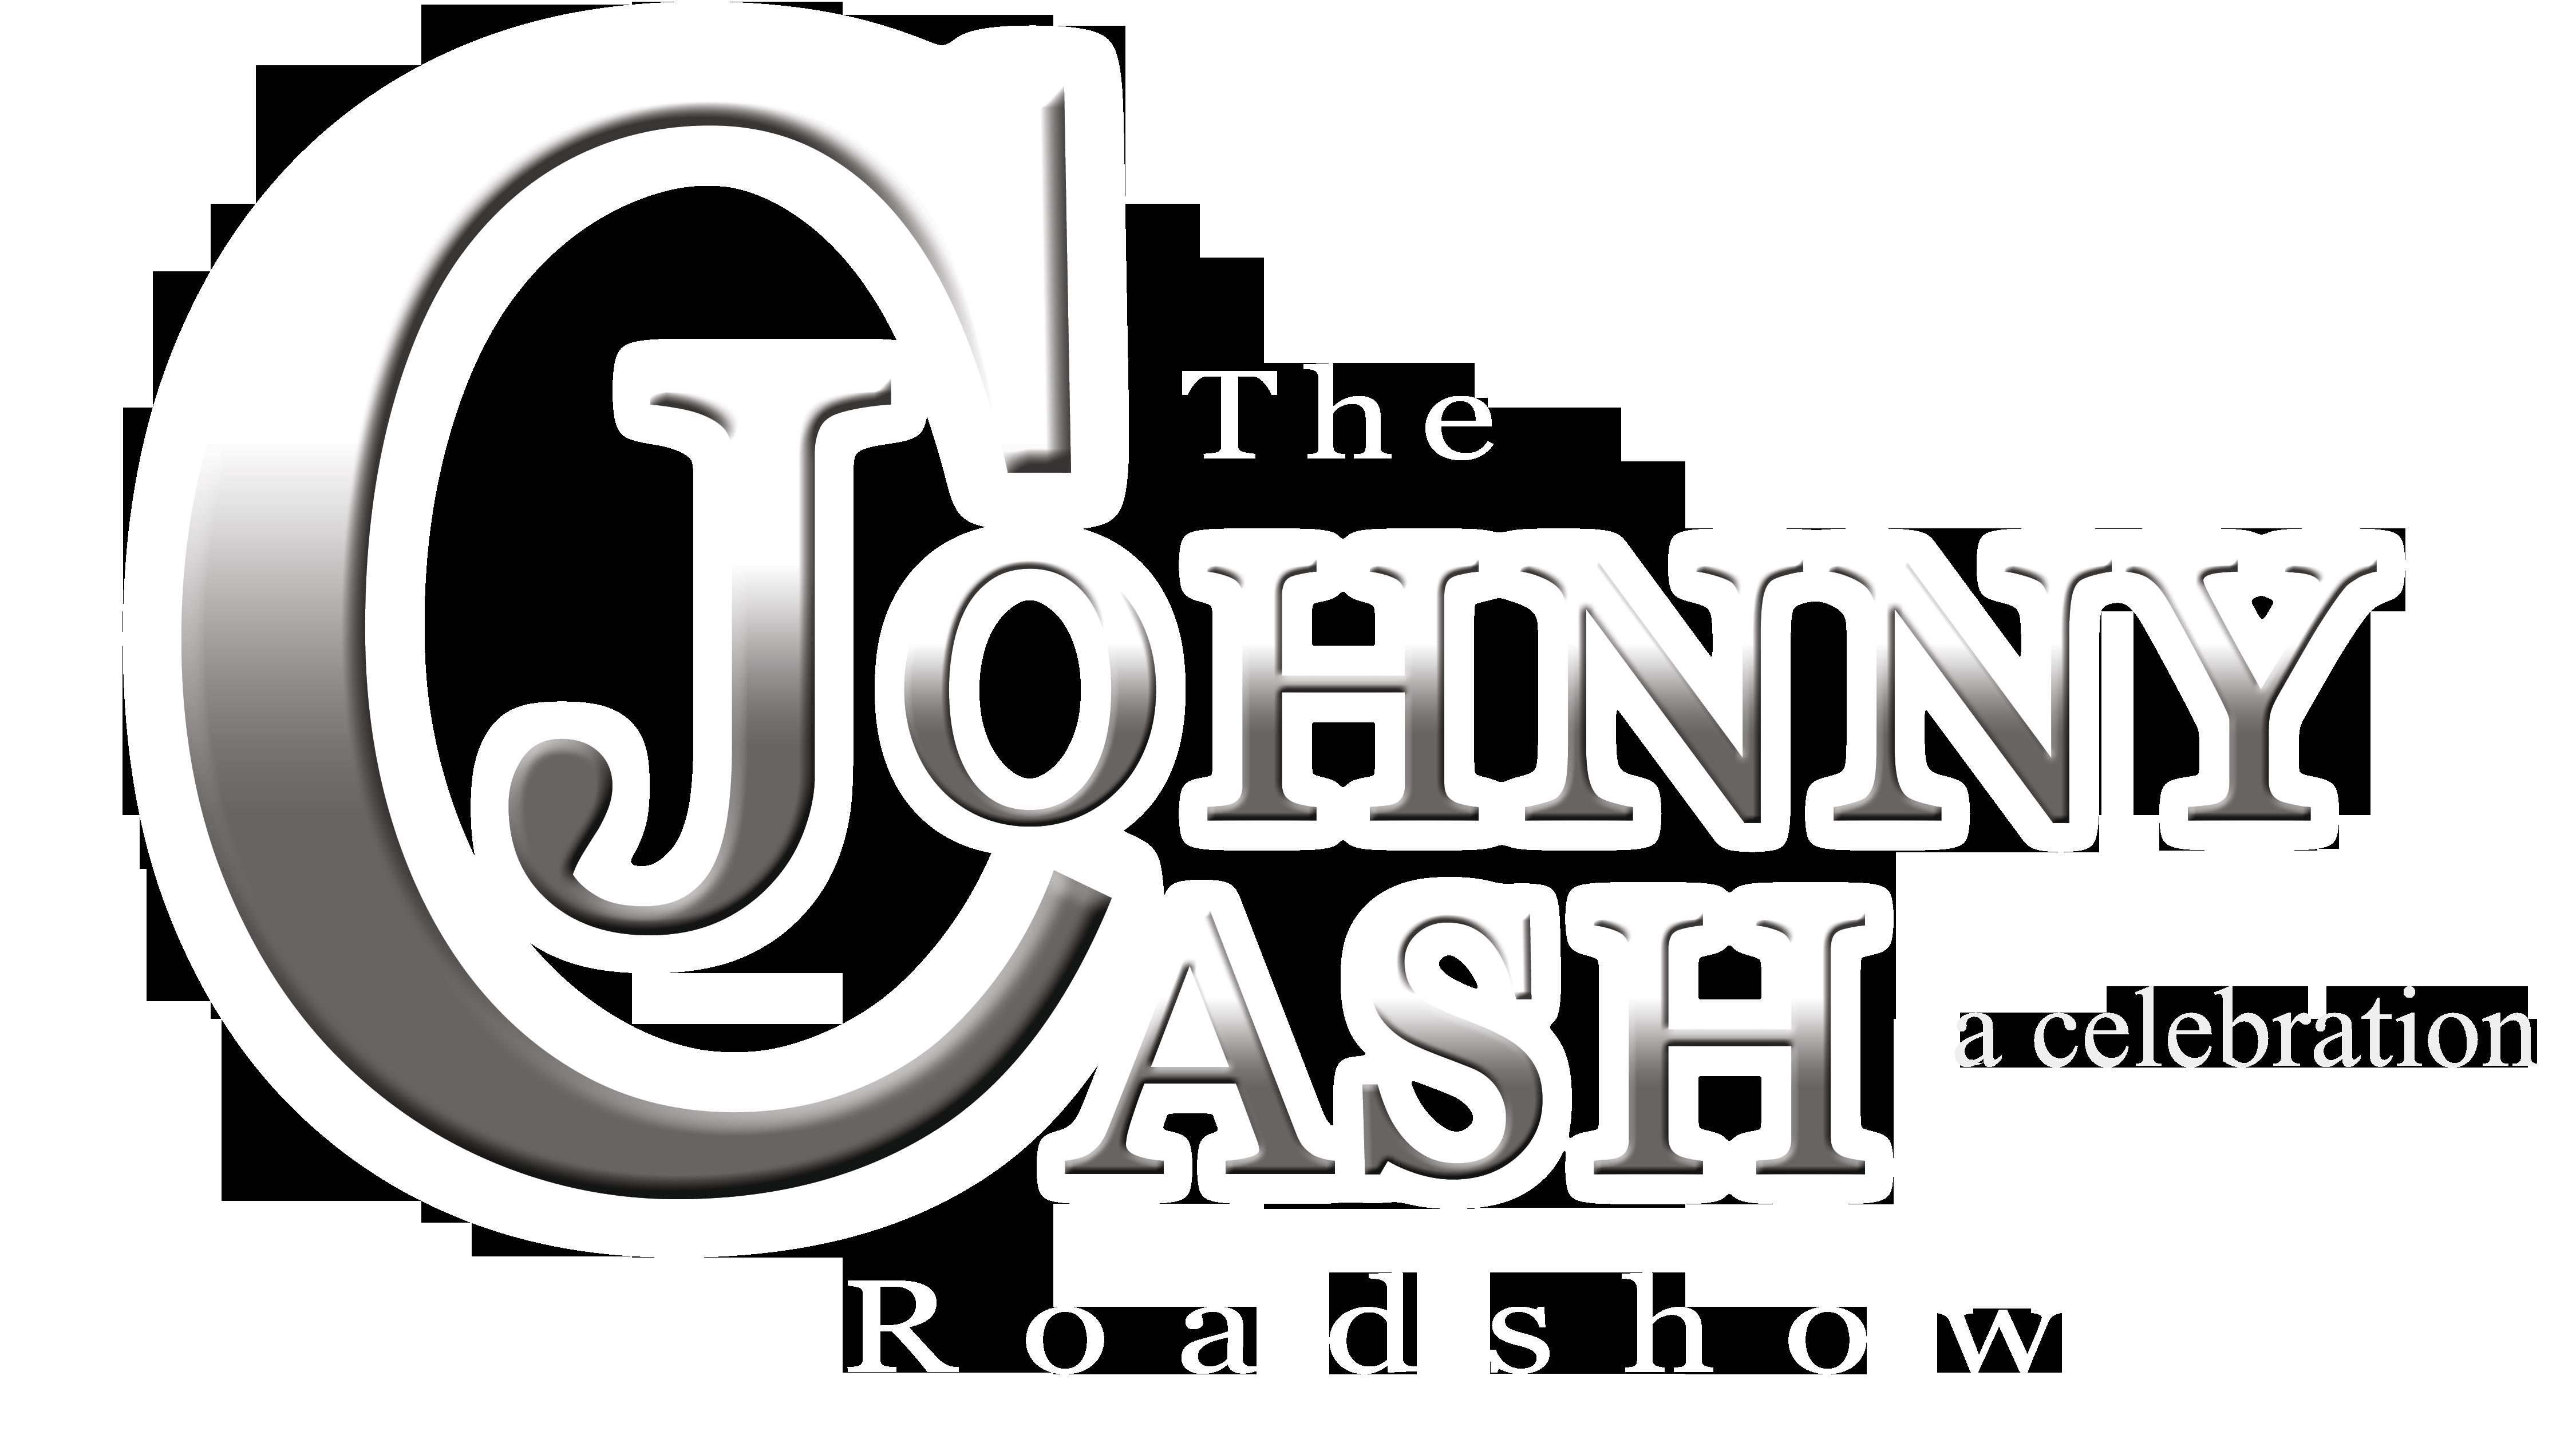 Johnny Cash High Definition